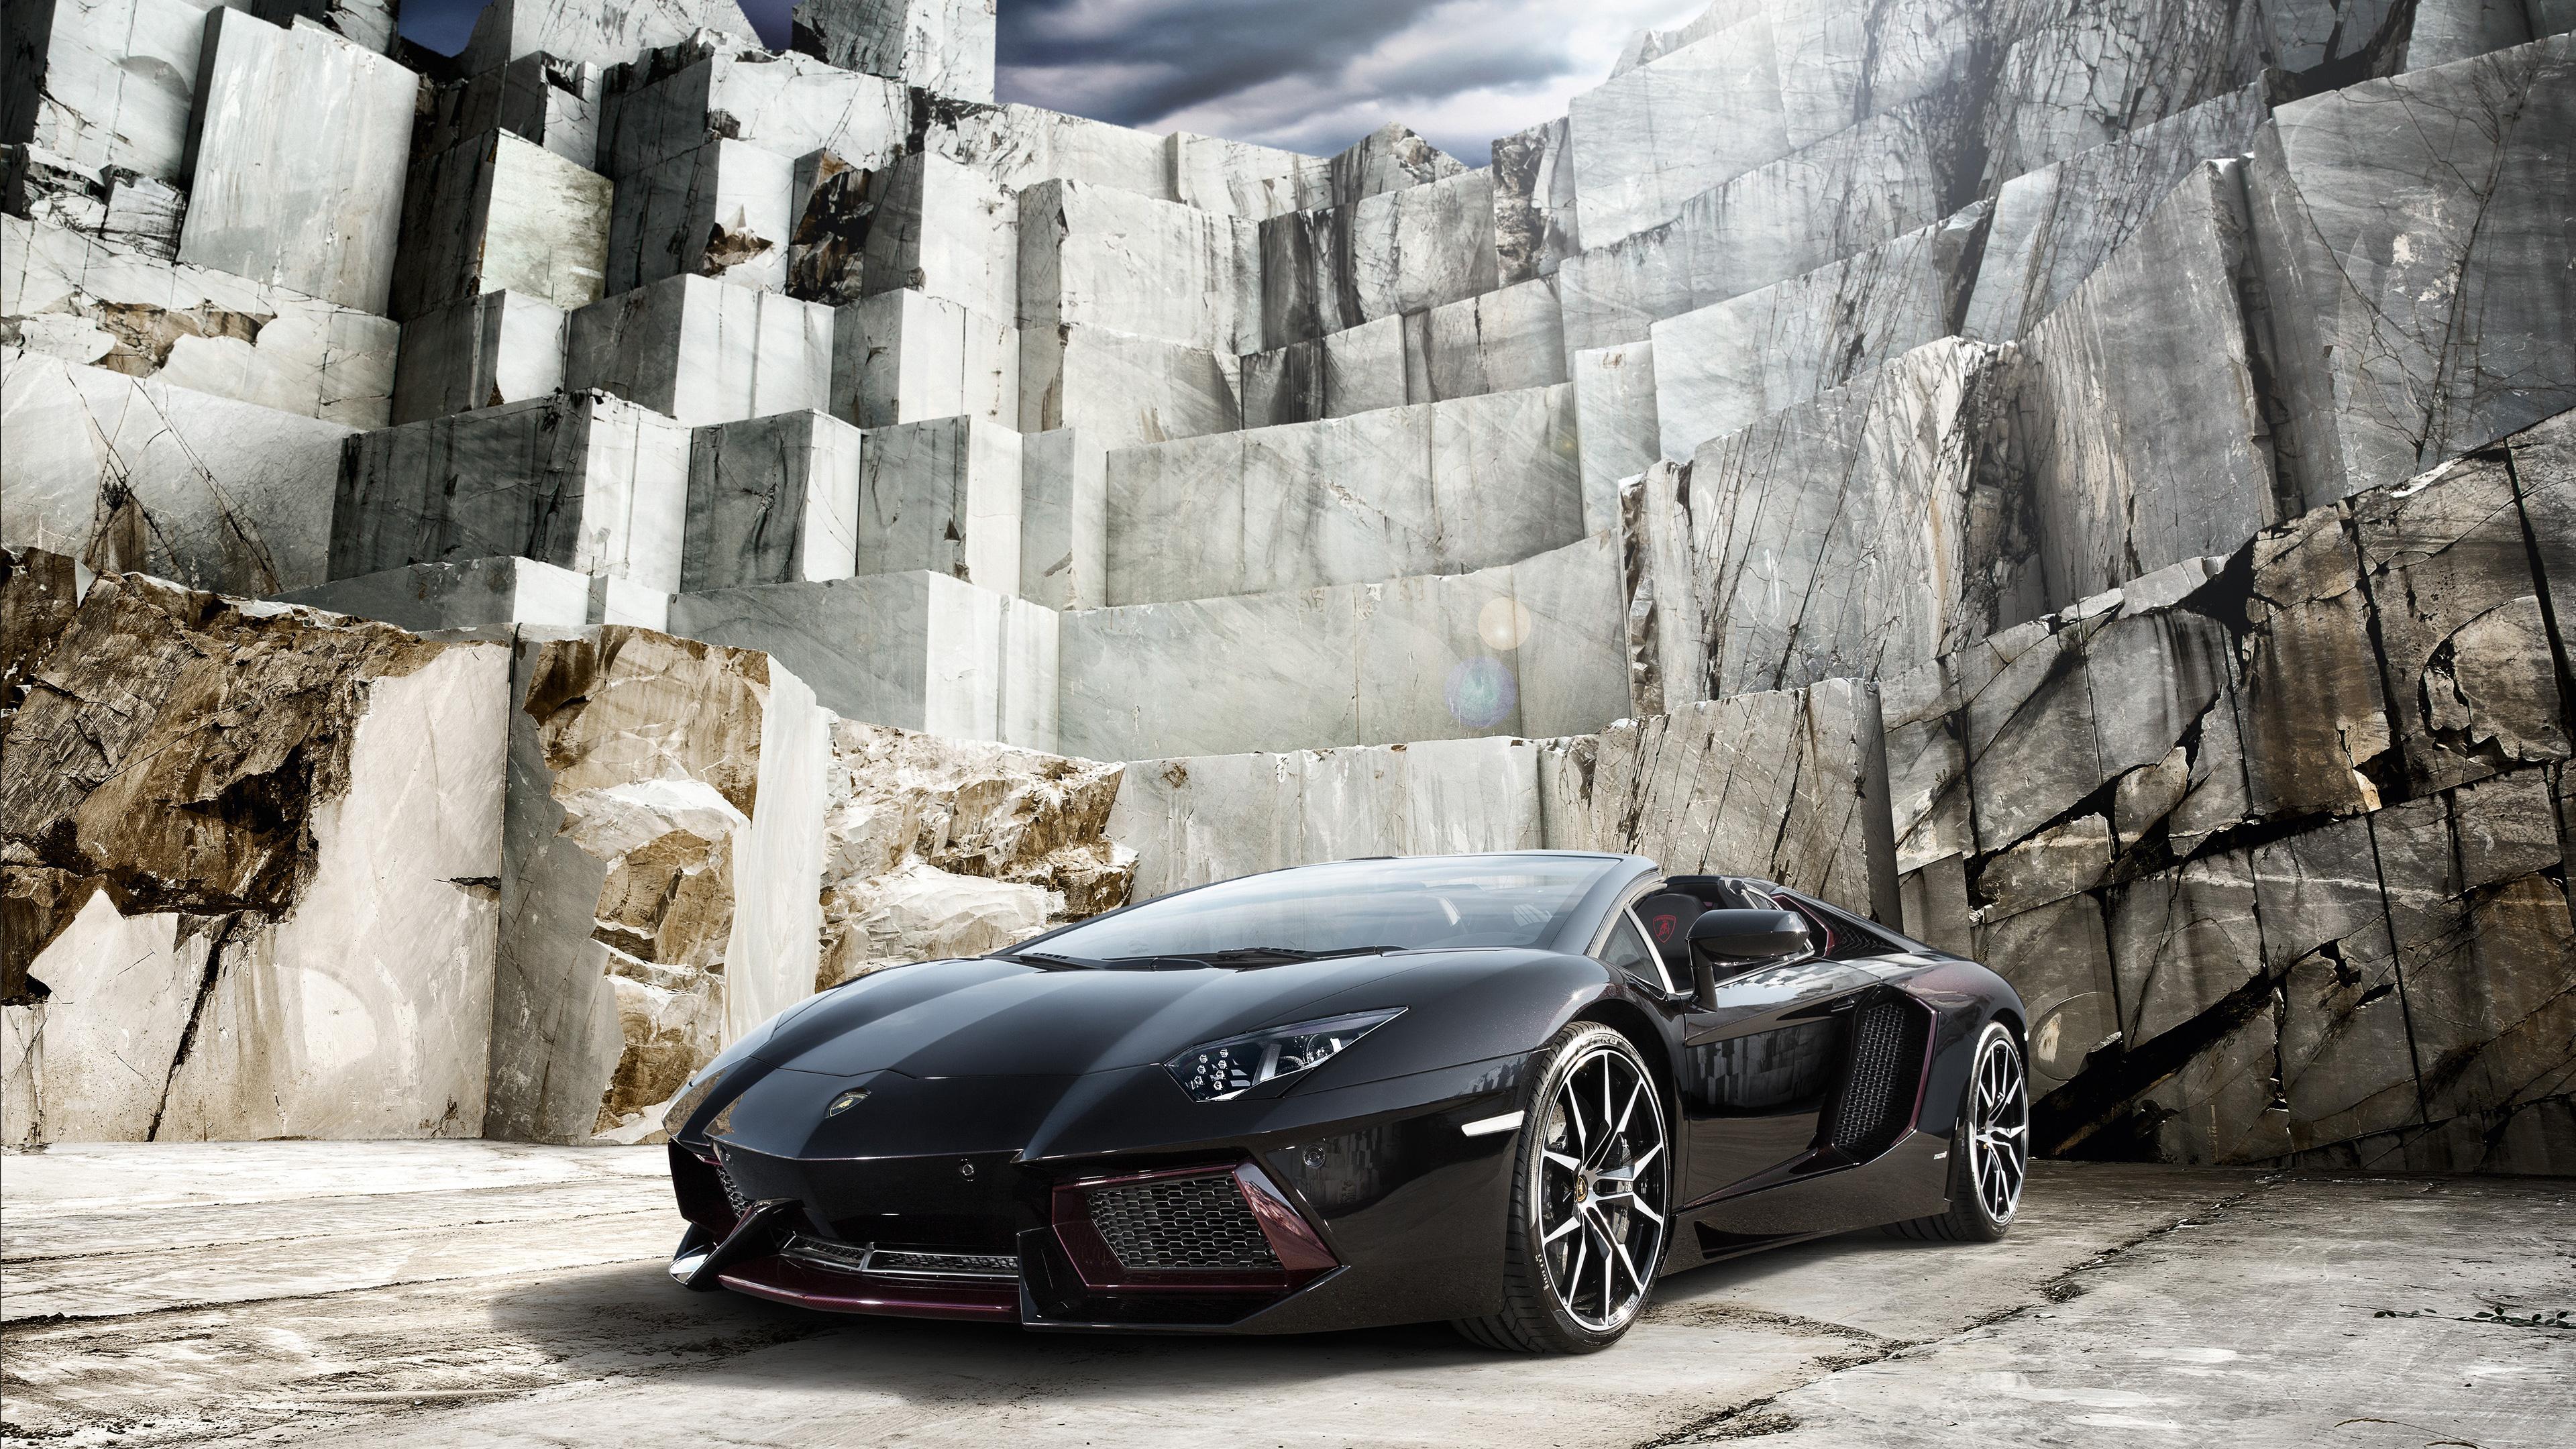 Black Lamborghini Aventador 4k Hd Cars 4k Wallpapers